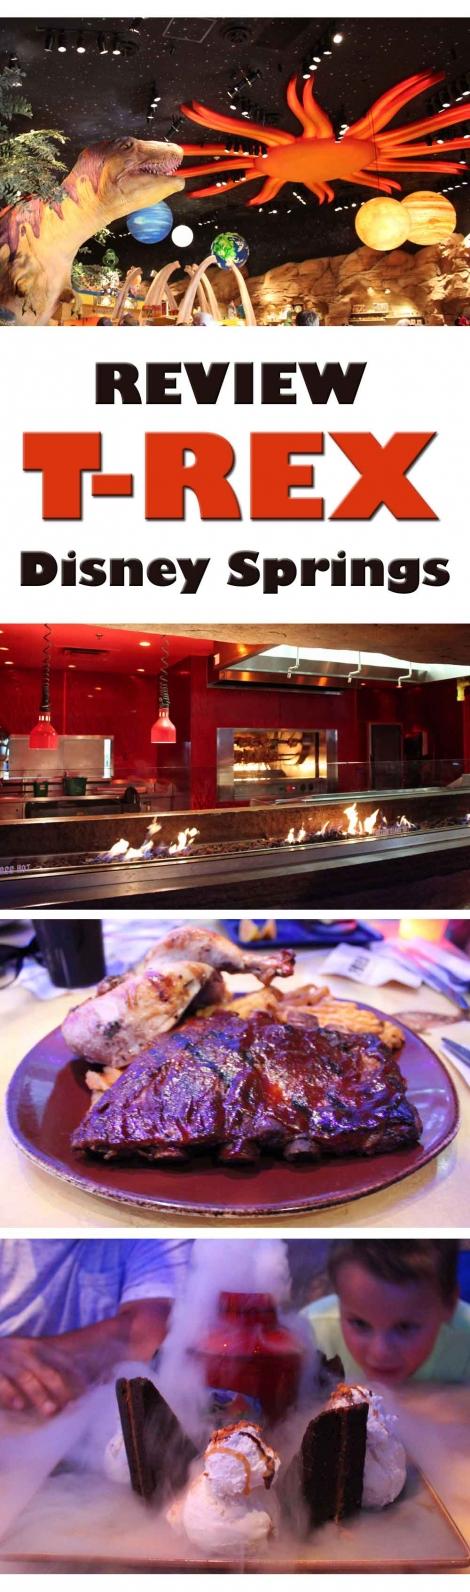 TREX-Food-Photos-Restaurant-Review-Disney-Springs-(pin)